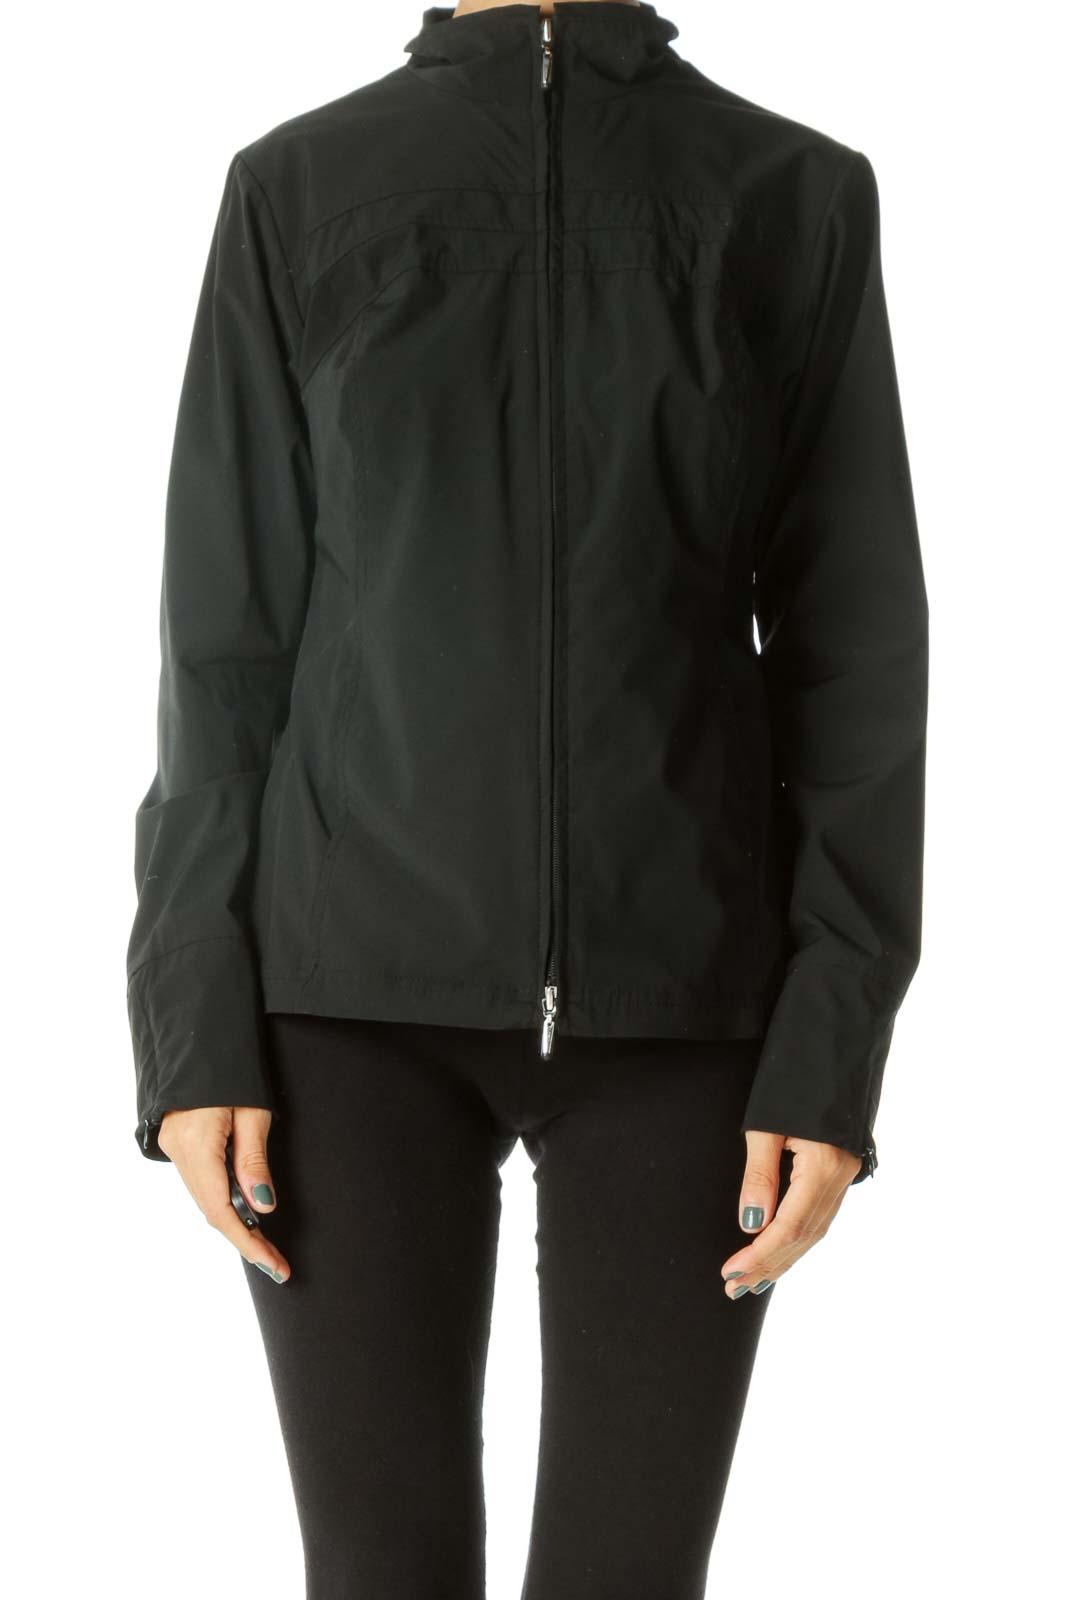 Black Zippered Sleeve Detail Pocketed Stretch Sport Jacket